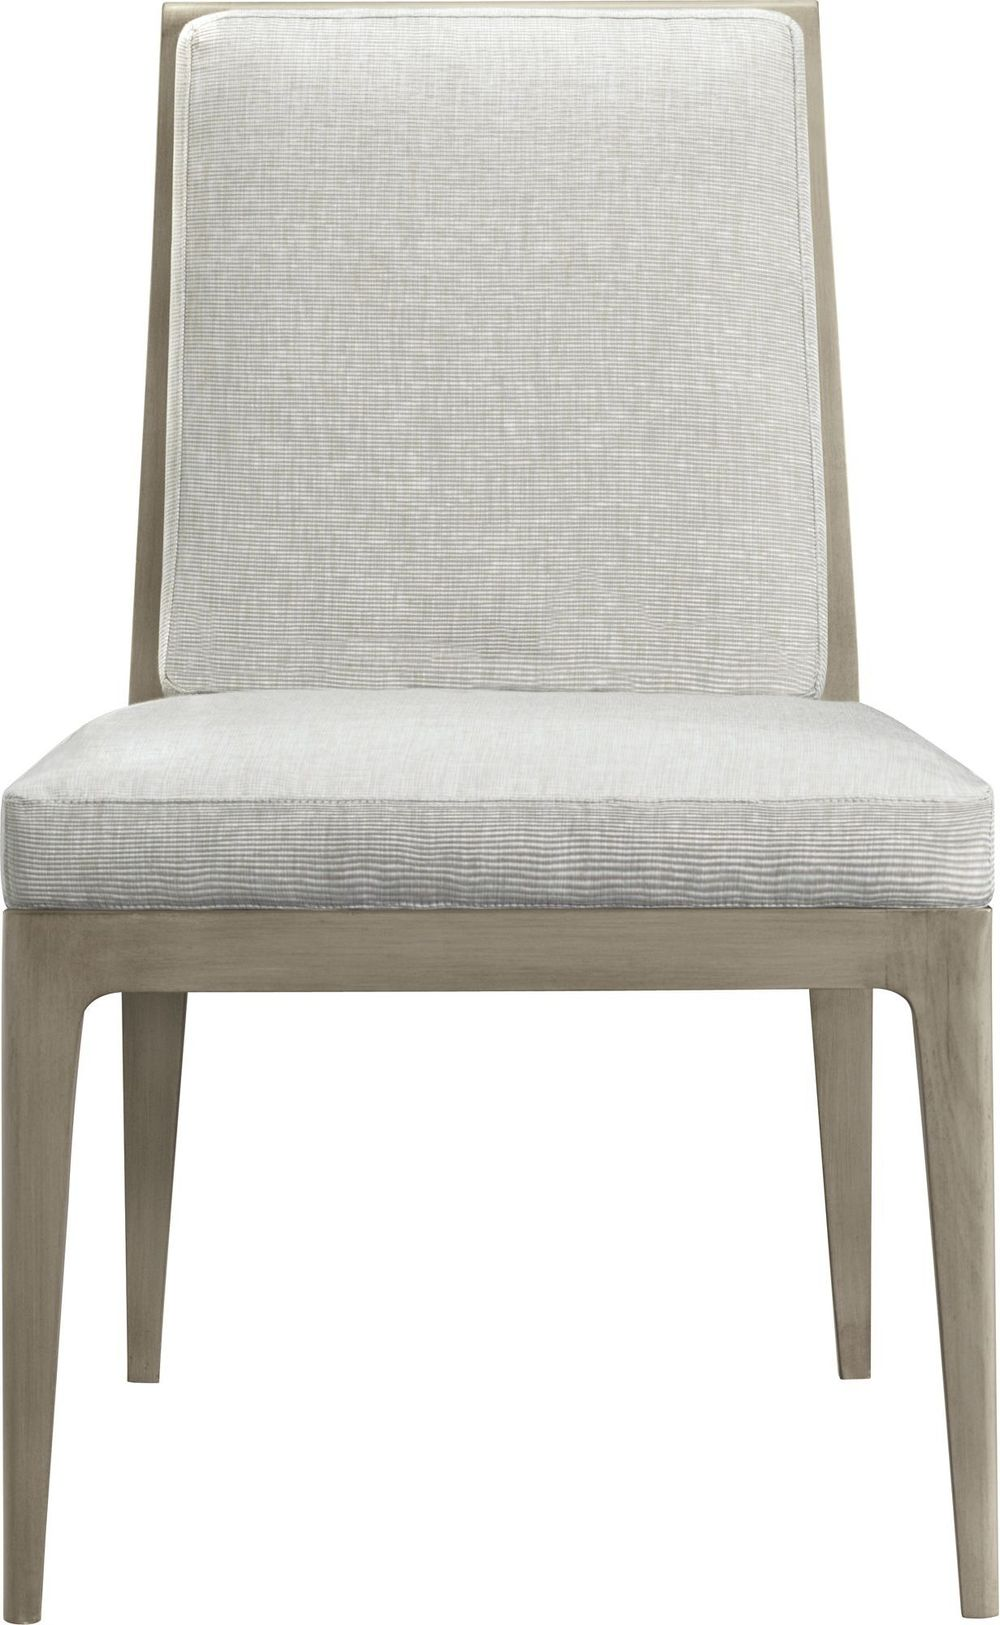 Baker Furniture - Carmel Caned Dining Side Chair